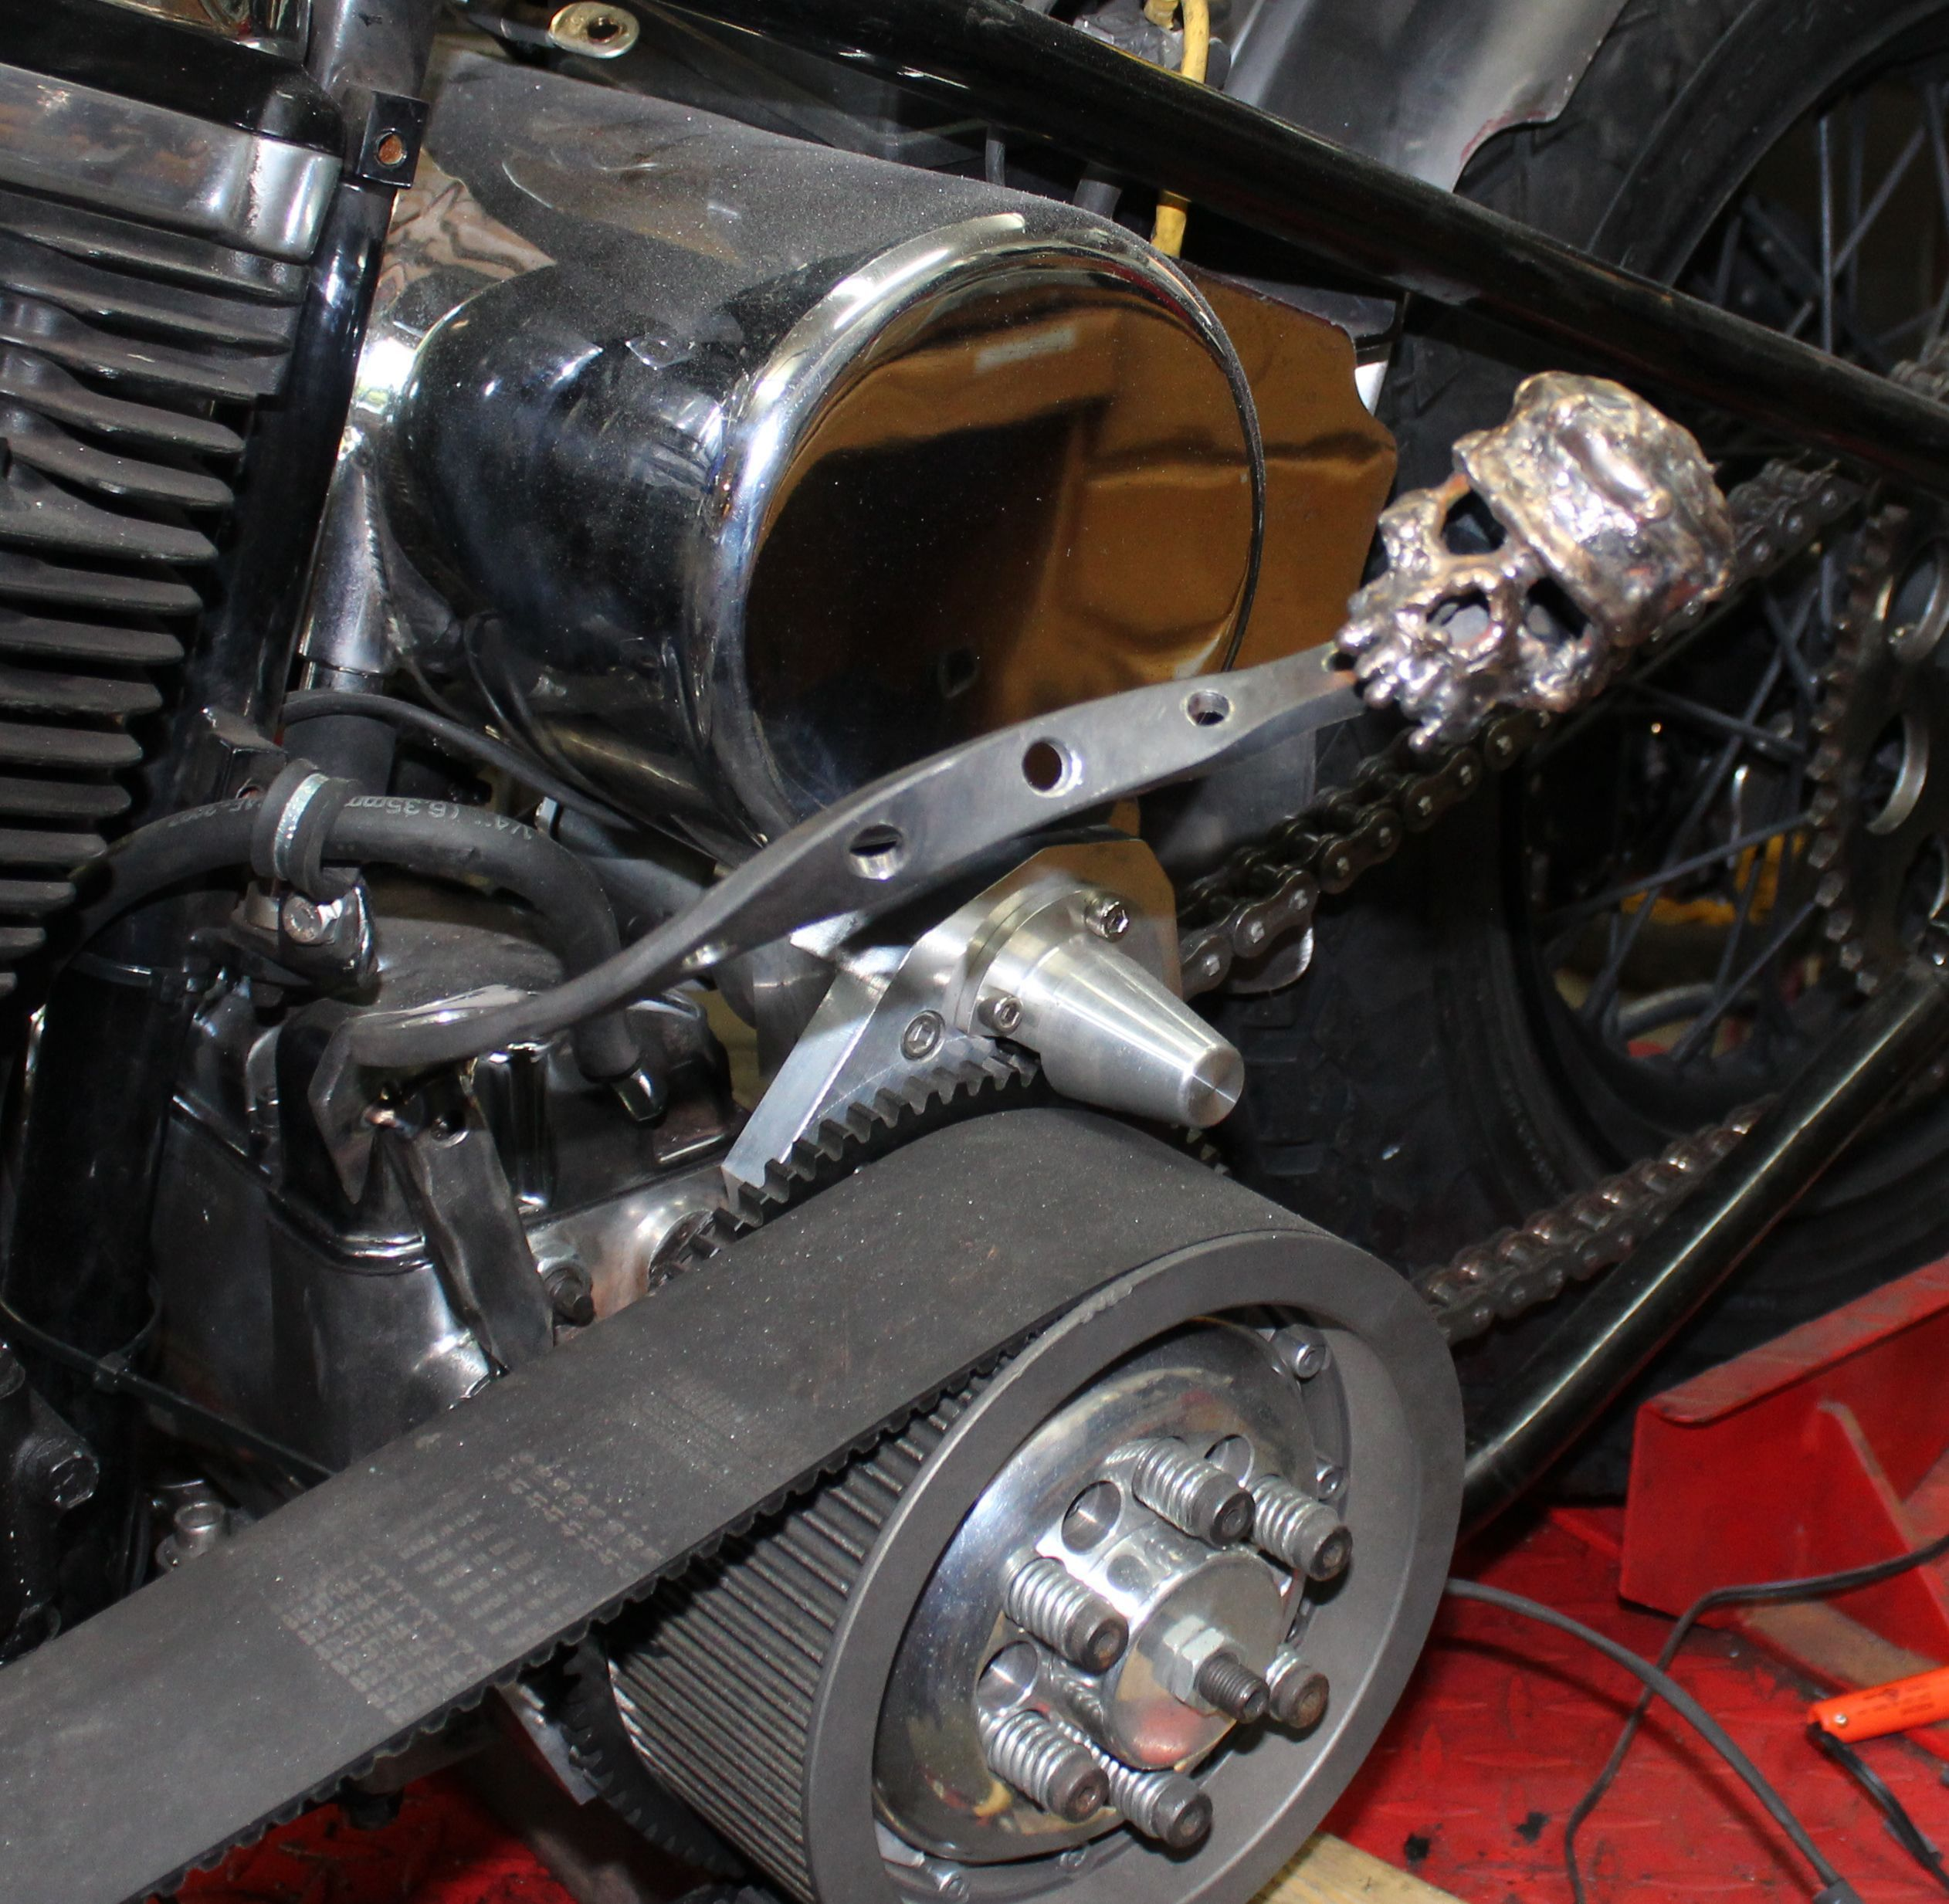 Jockey Shifter Kits | Motorcycles & Build Ideas | Pinterest | Choppers